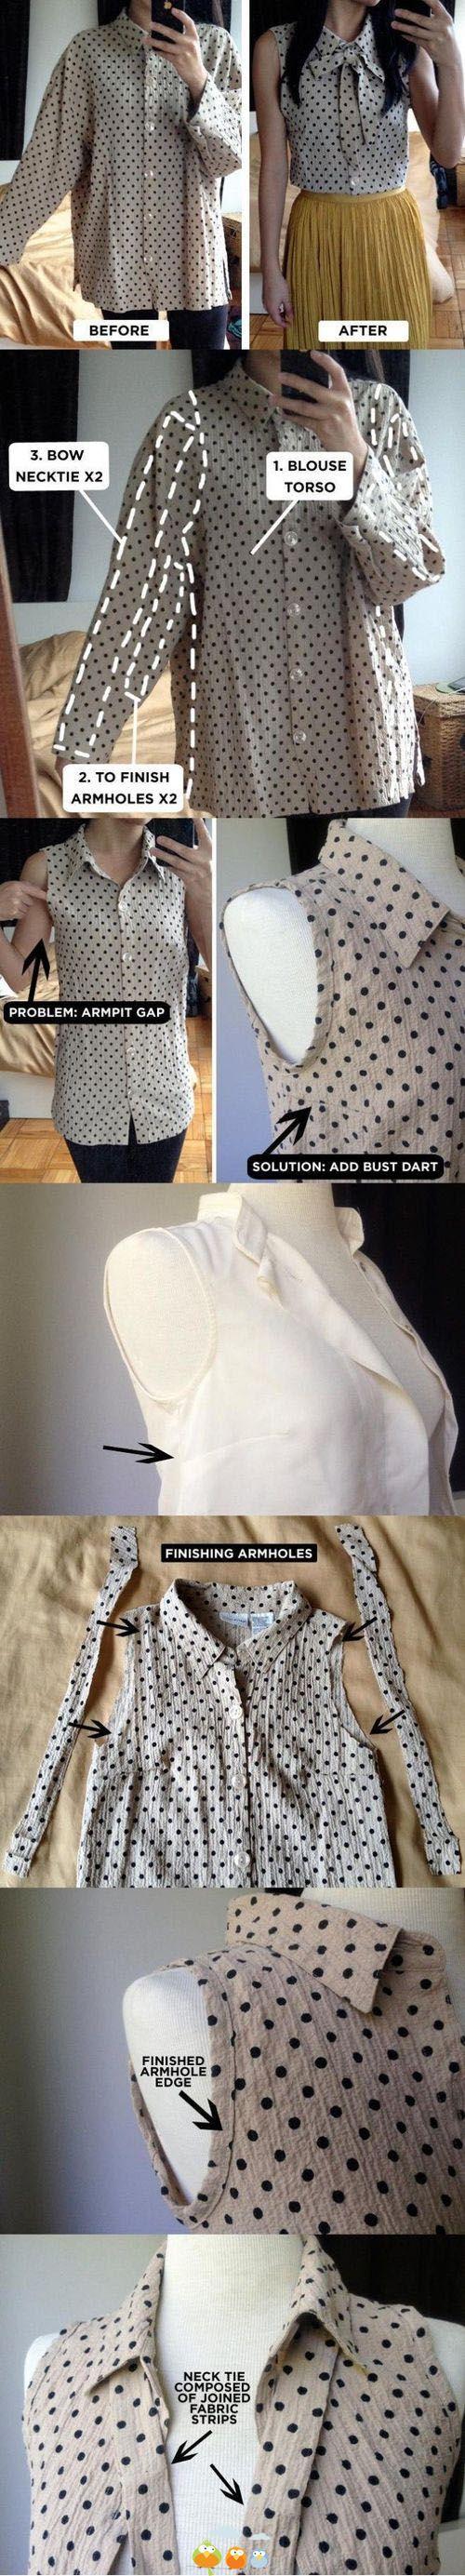 reformando roupas